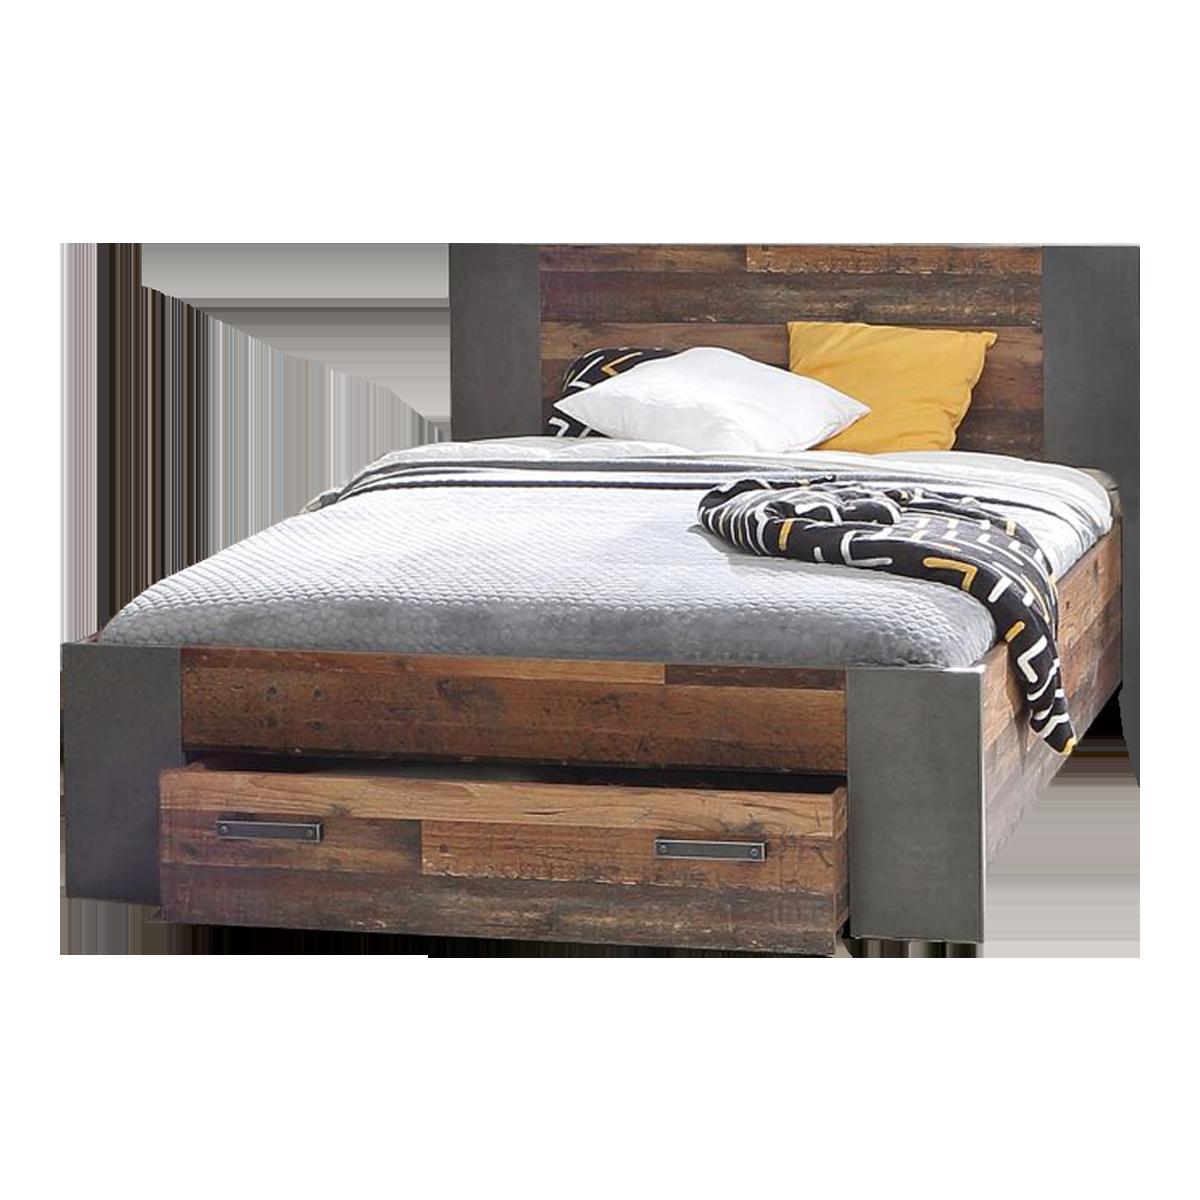 Full Size of Bett 140 X 200 Jugendbett In Old Wood Nachbildung Liegeflche Cm 1 40x2 00 180x200 Günstig Flexa Betten 140x200 Mit Matratze Und Lattenrost 200x200 Bettkasten Bett Bett 140 X 200